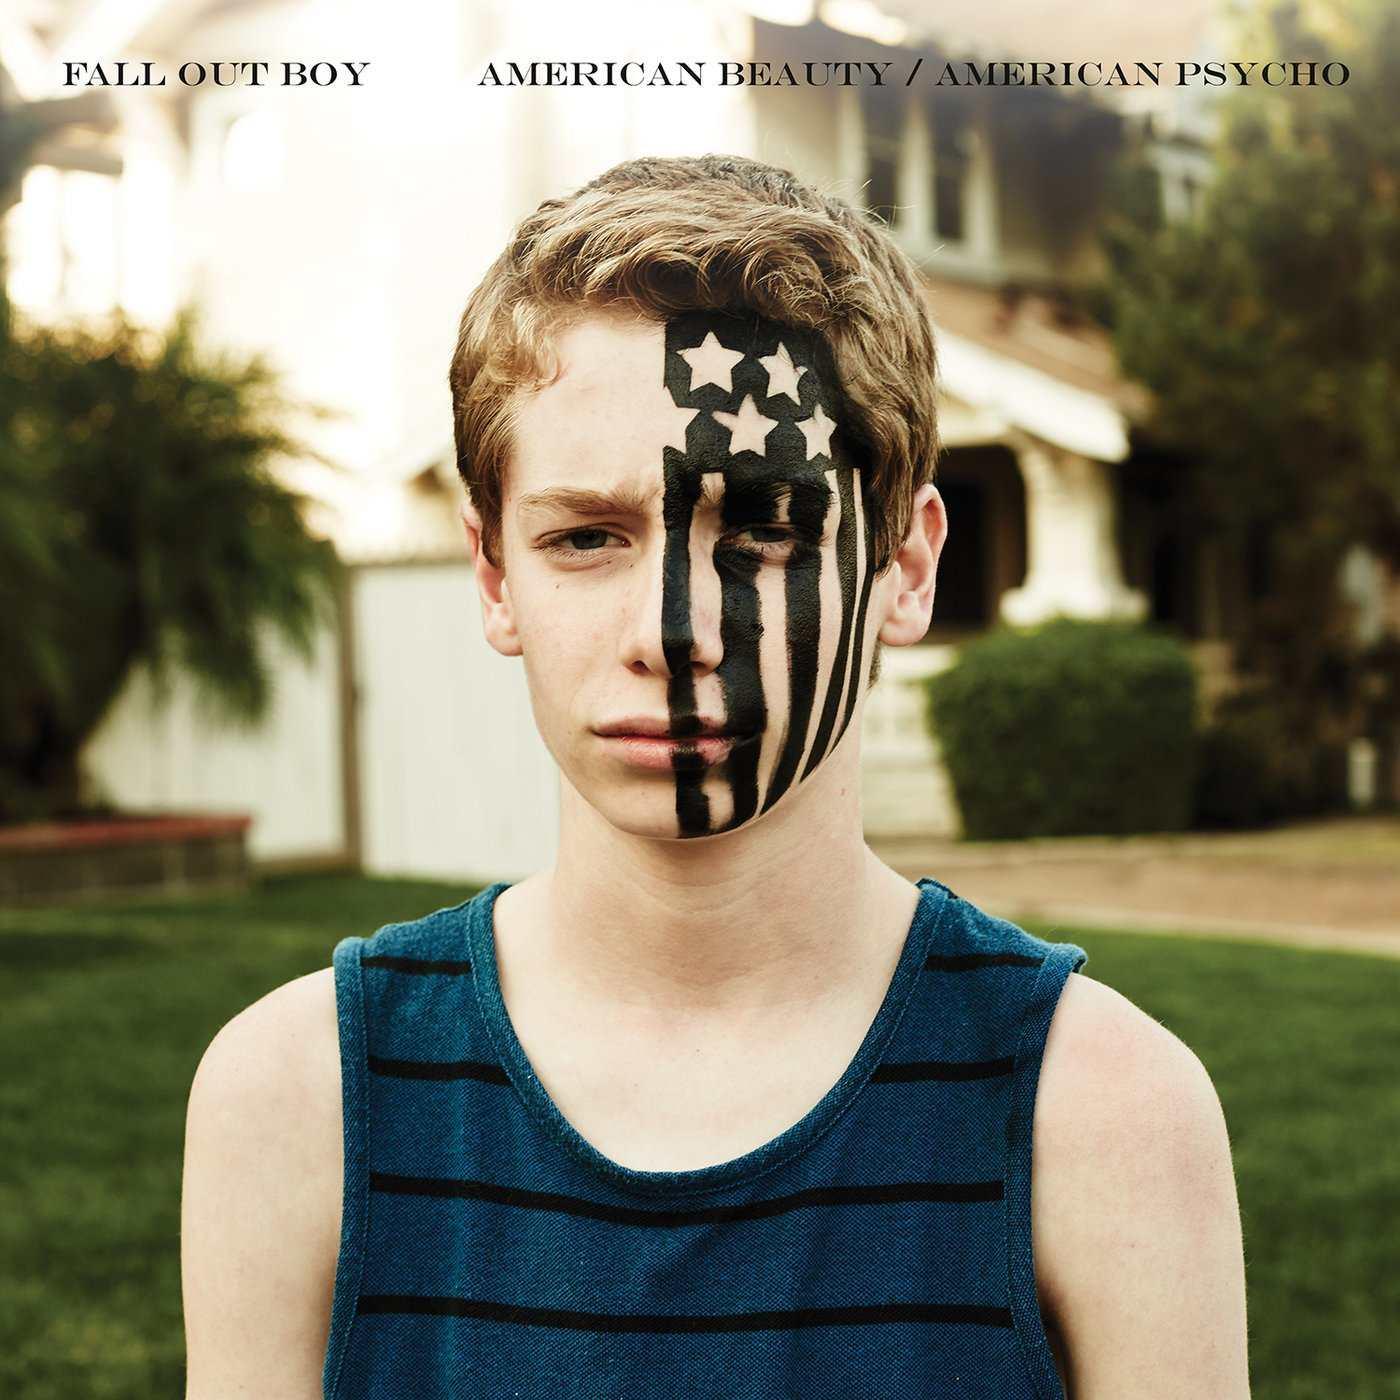 Fall Out Boy American Beauty American Psycho